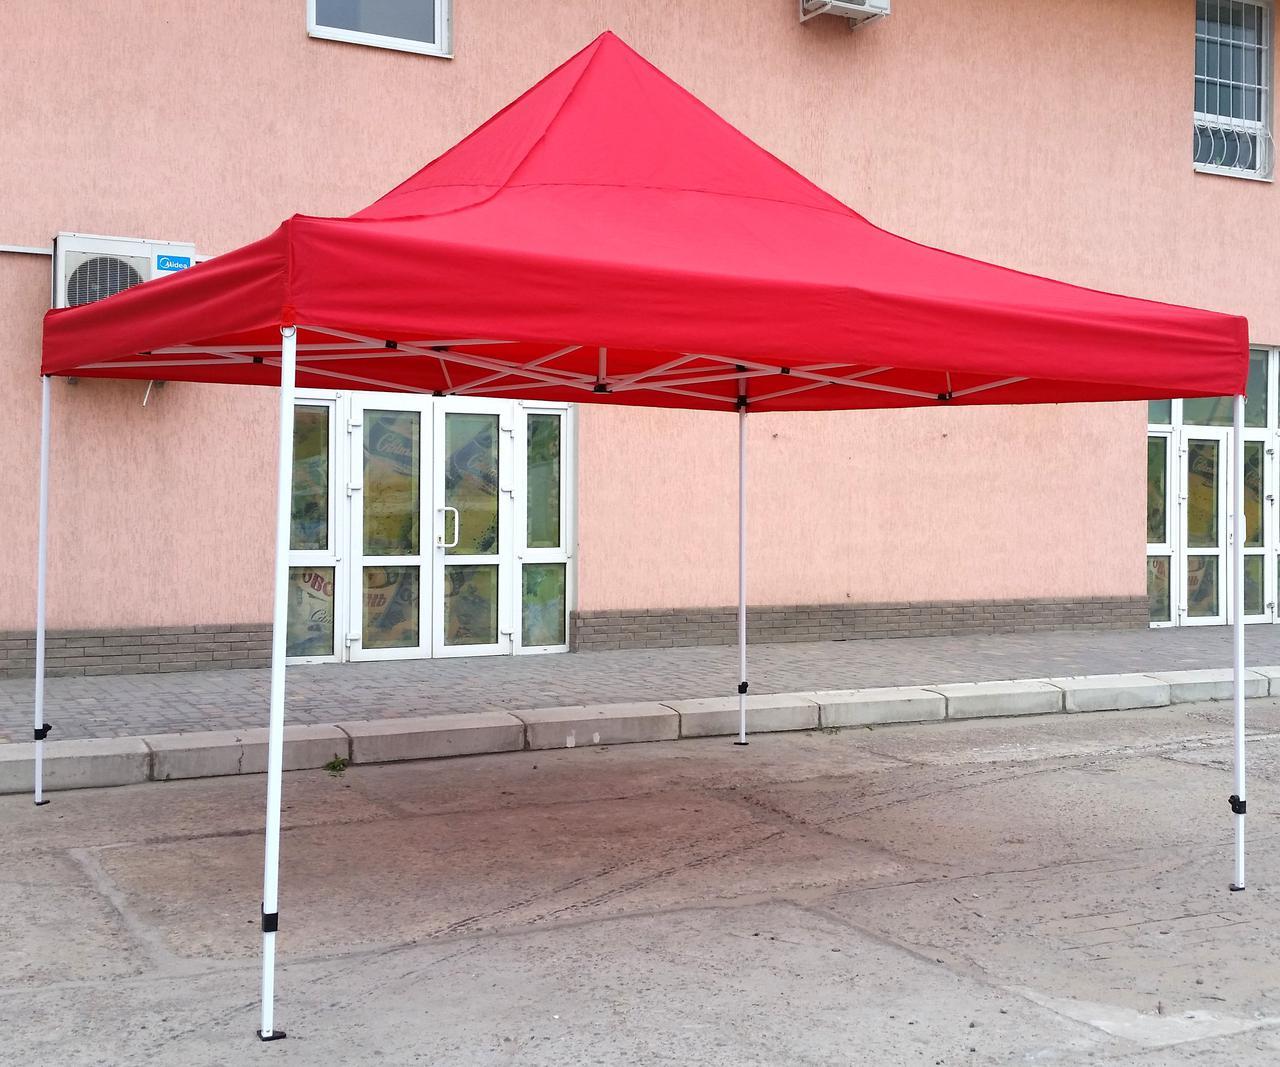 Шатер раздвижной, палатка, беседка, павильон, тент, 4х4(4*4), 25 кг, каркас белого цвет